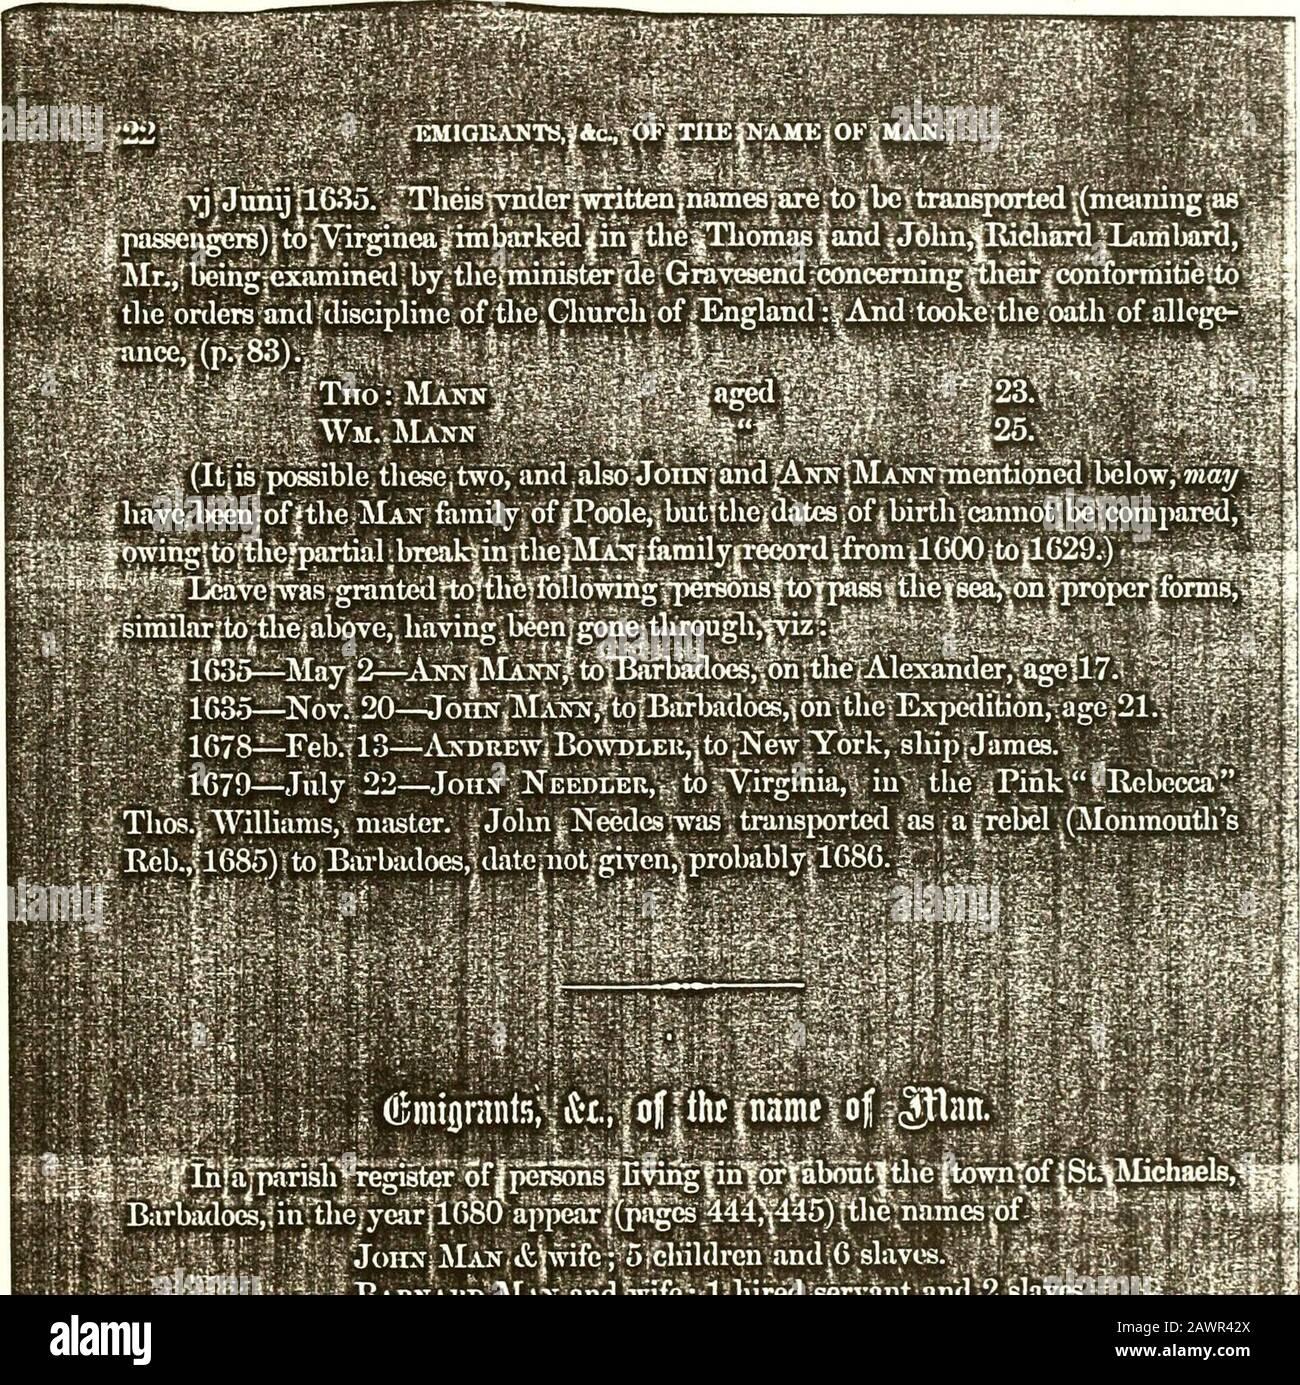 Registro de las familias Man, Needles (Nedels) y Hambleton...1495-1876 . 1.1/, En J.-Ail C 1.1 .III HllV/ij =-*. ¿Ji yp~ga? :TIIK IMST* FAMIEY|in |NEW|ENGLU>jJohni|Manu/|Genk to 1082 i,jof|3aTnaic  ?le namcpvmby| : He| isfmeritiohed j como .oijieiifof jthe| encuesta ois de Eehobotli 383 Jiine 9, 1( .1M..aiidas teniendo Foto de stock